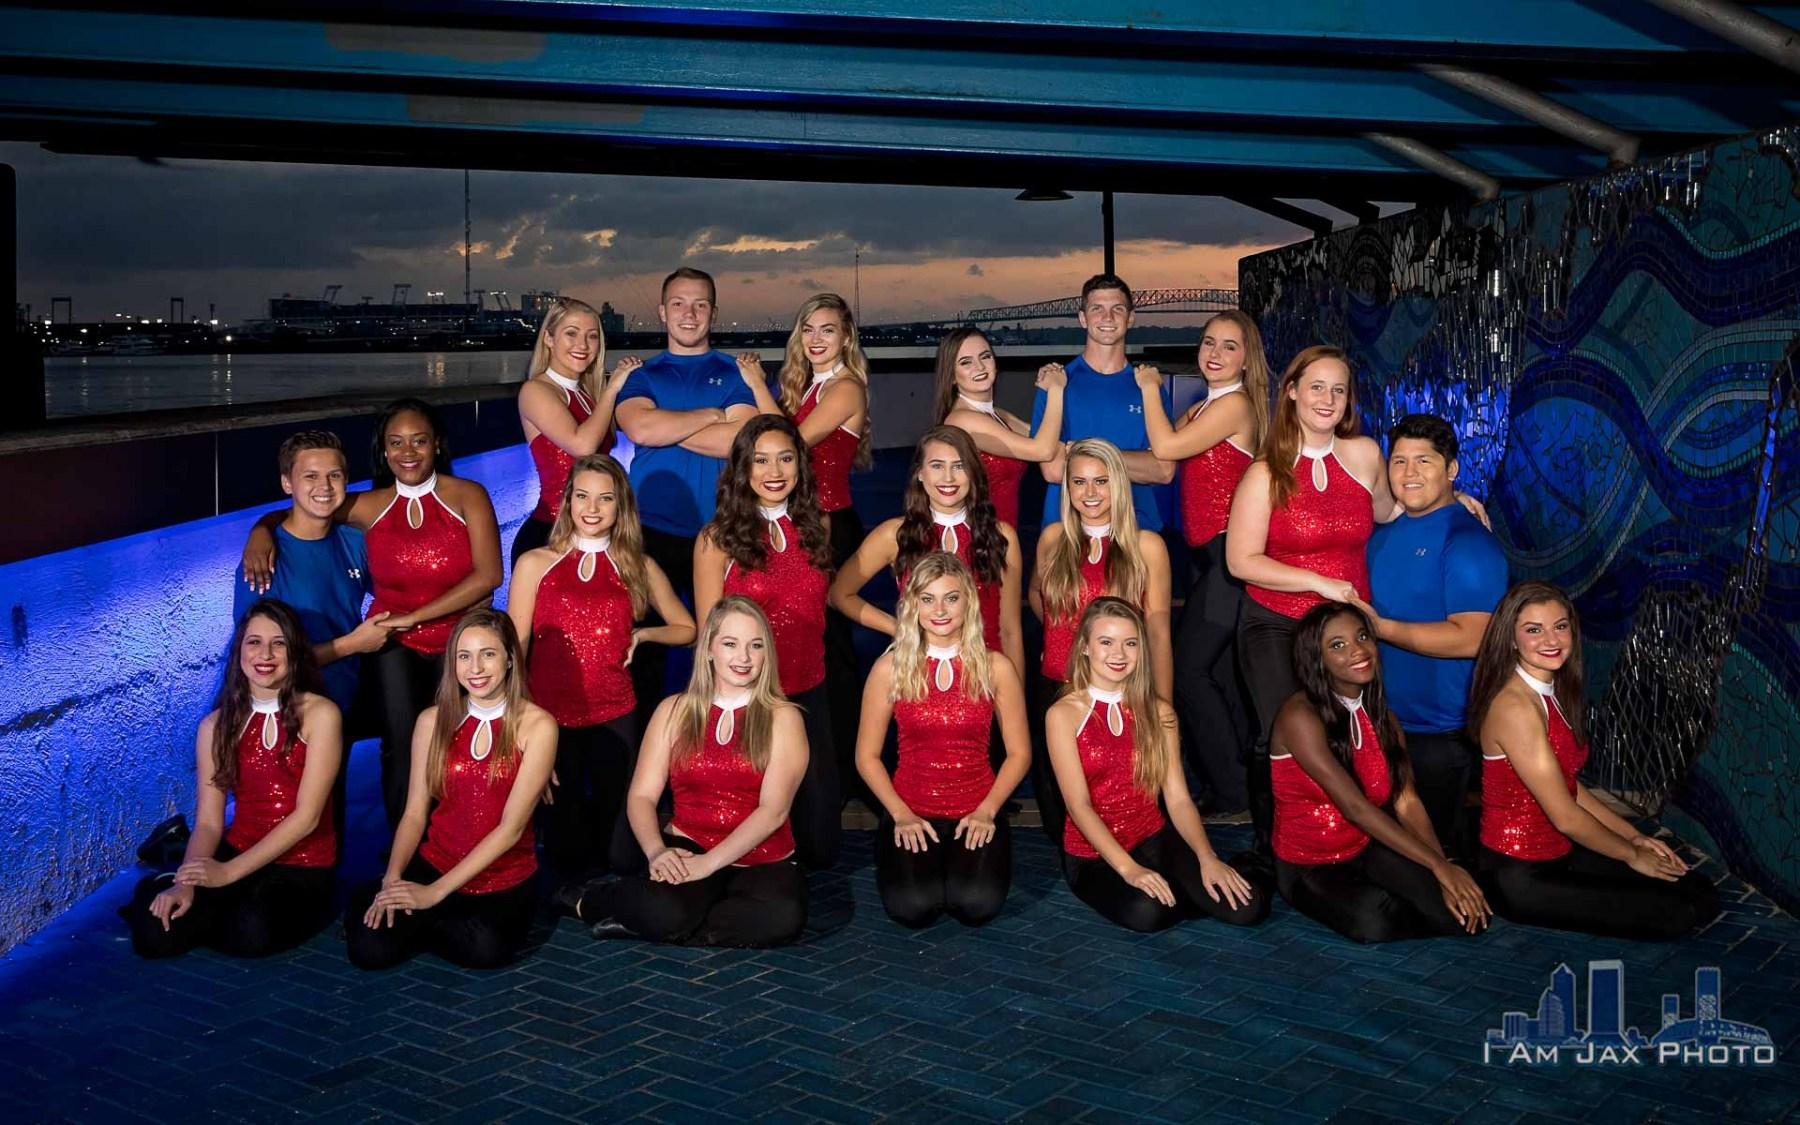 Showtime USA Dance Studio Portrait